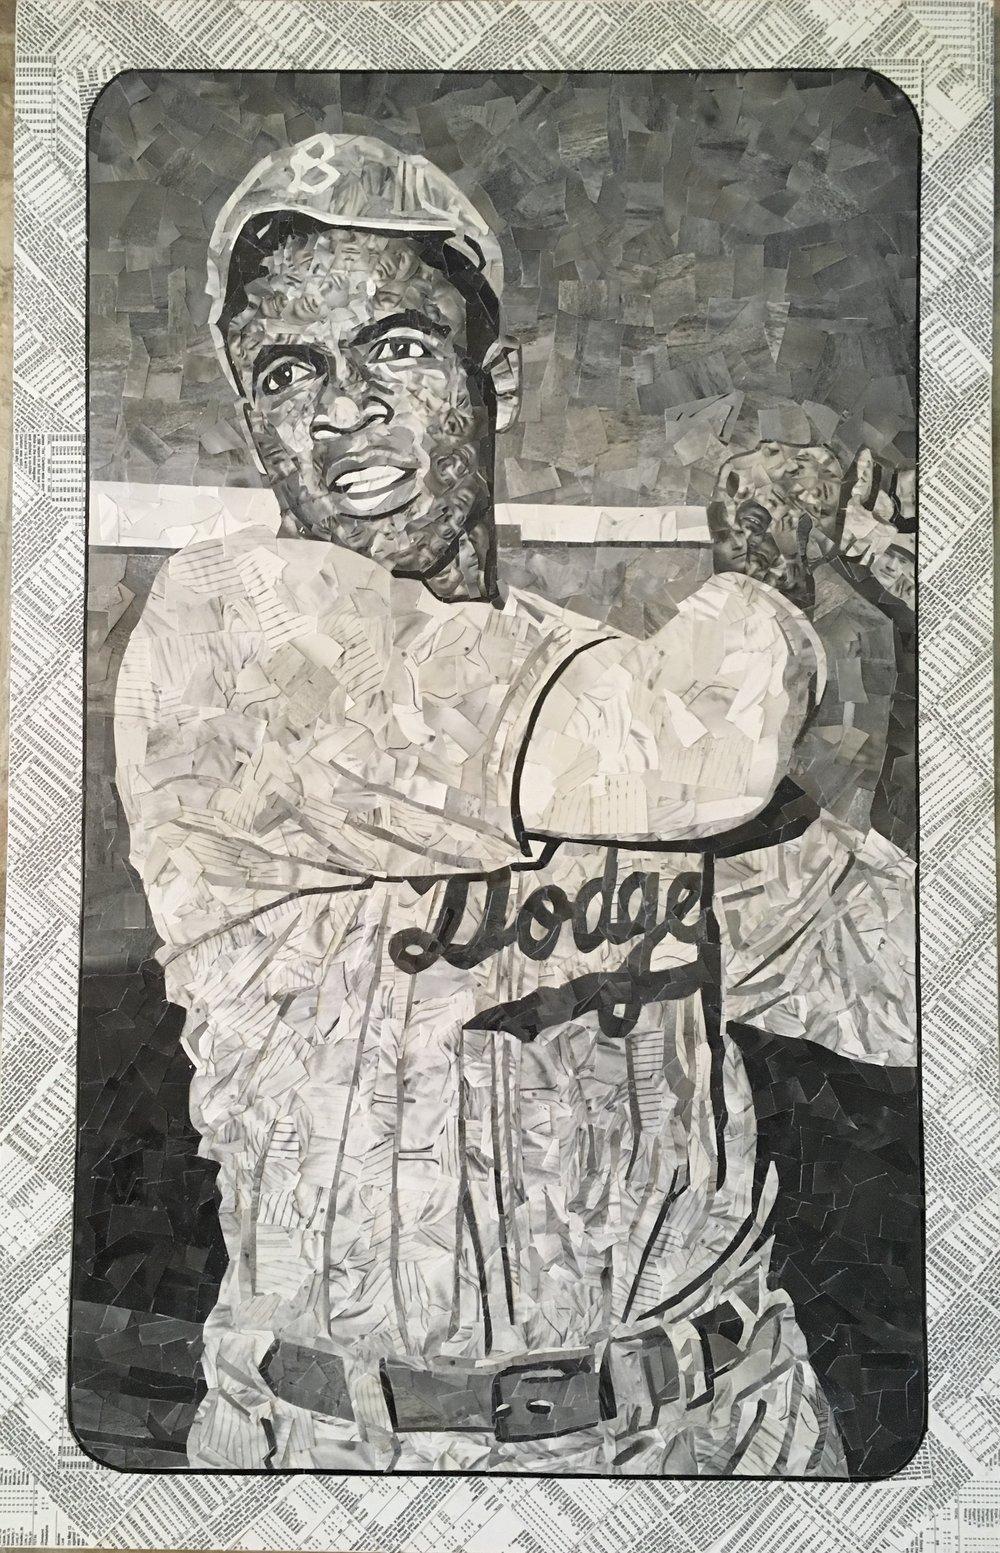 1947 Bond Bread Jackie Robinson (Bat Follow, White Sleeves)